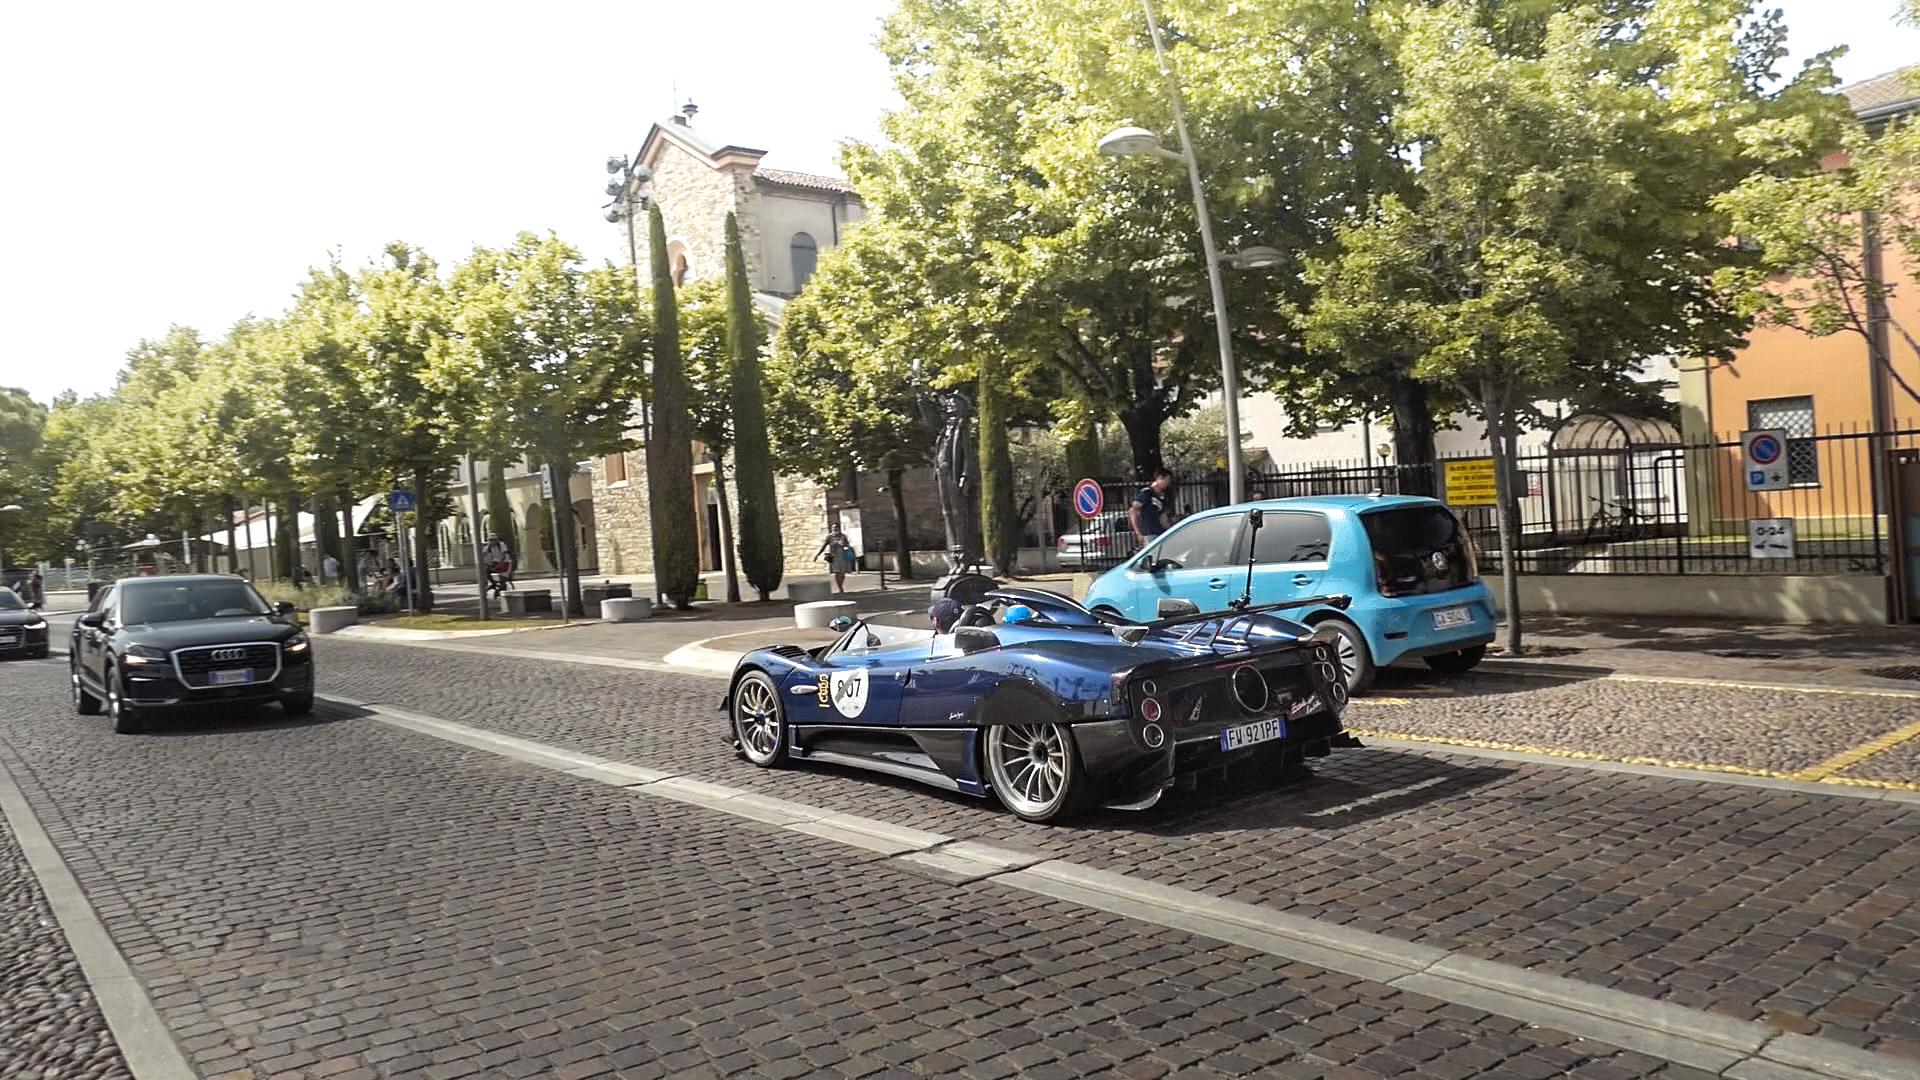 Pagani Zonda HP Barchetta - FW-921-PF (ITA)